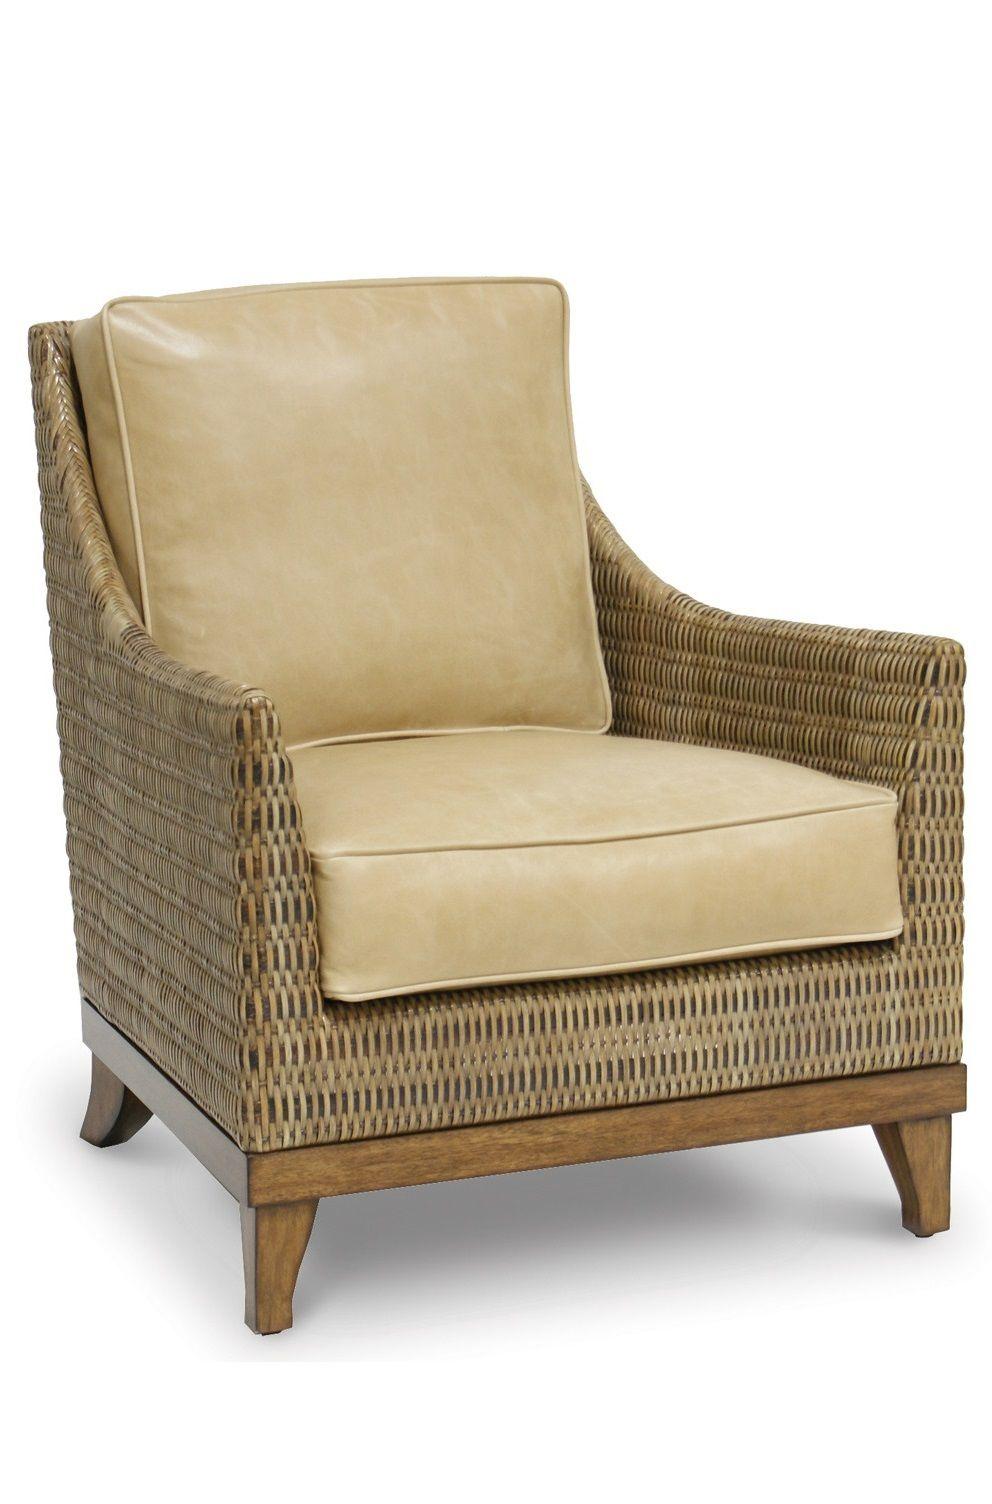 Luxury Resort Hotel Furniture